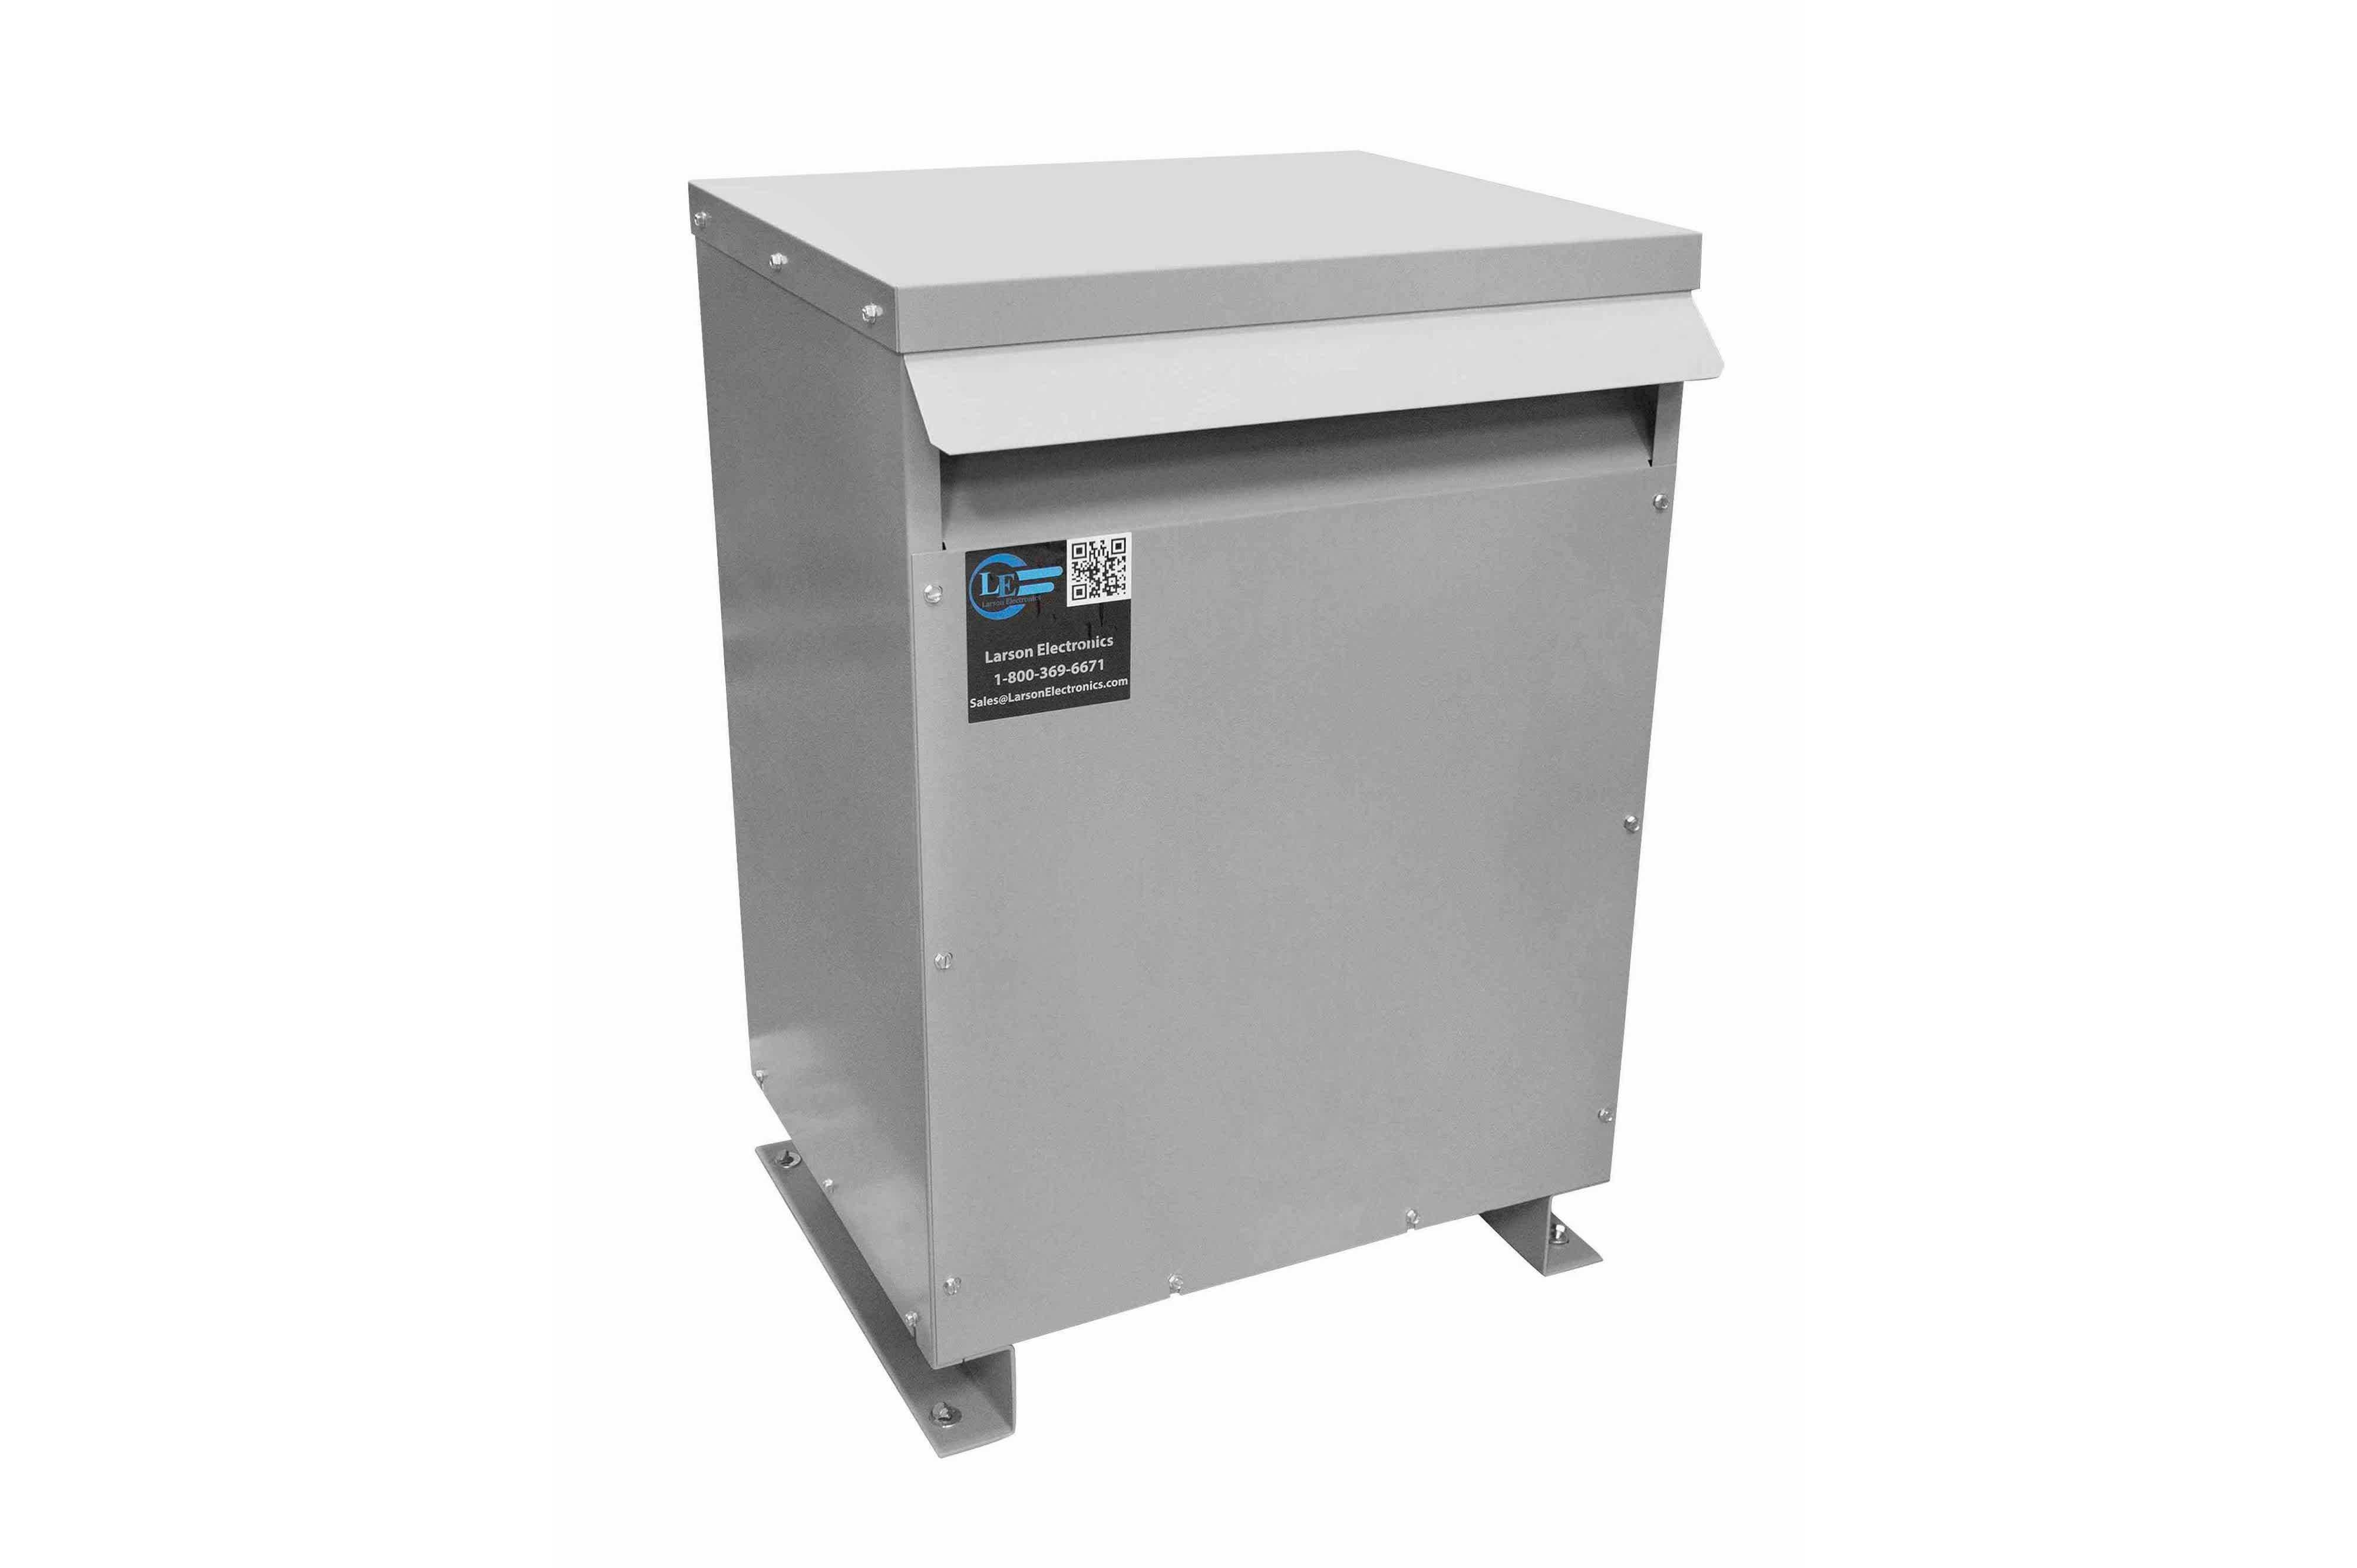 800 kVA 3PH DOE Transformer, 380V Delta Primary, 600Y/347 Wye-N Secondary, N3R, Ventilated, 60 Hz